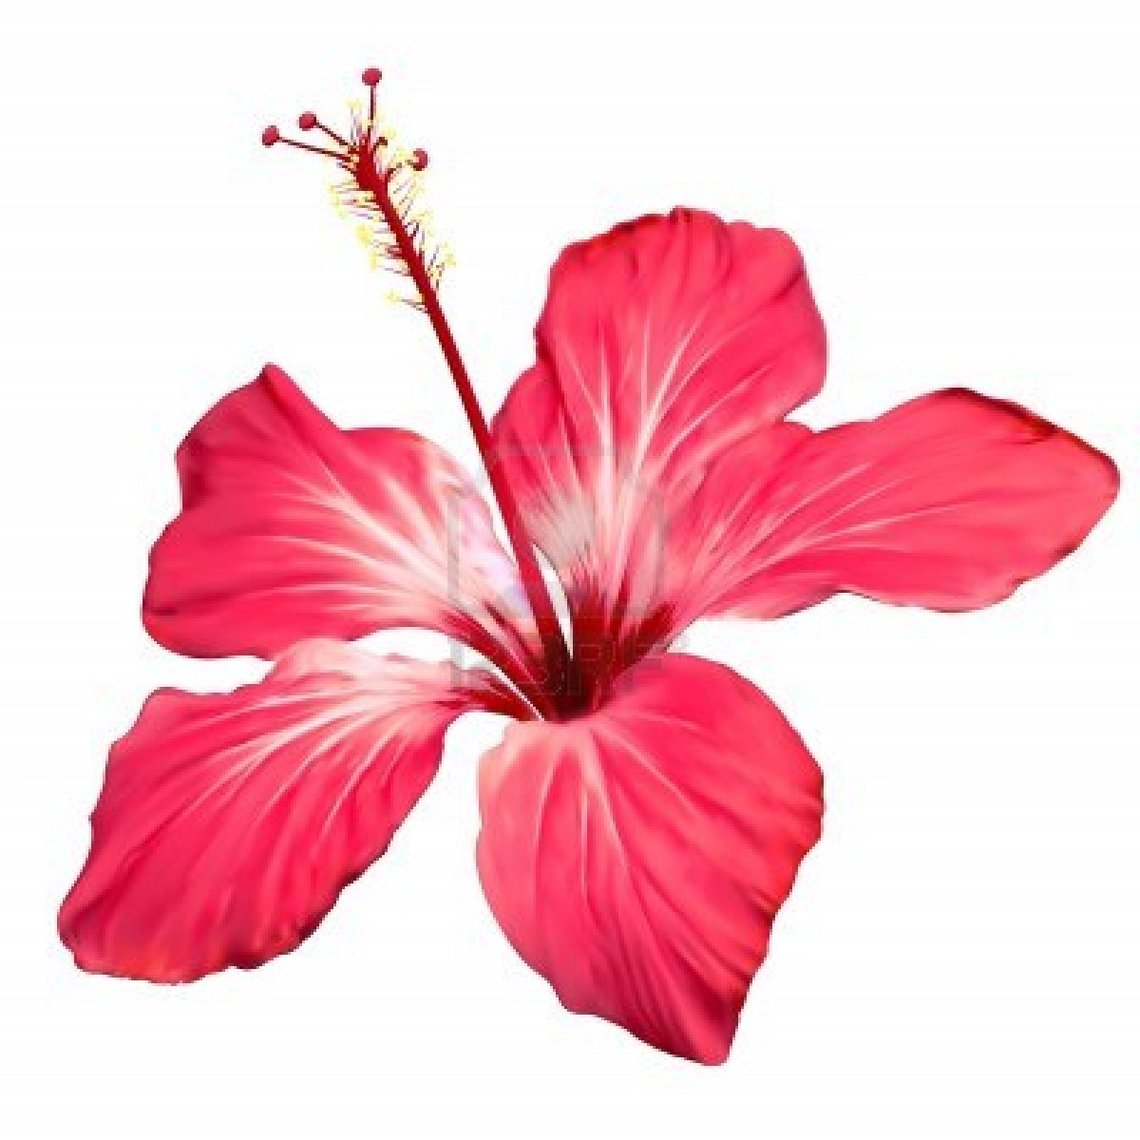 Red Flower clipart hawaiian #14